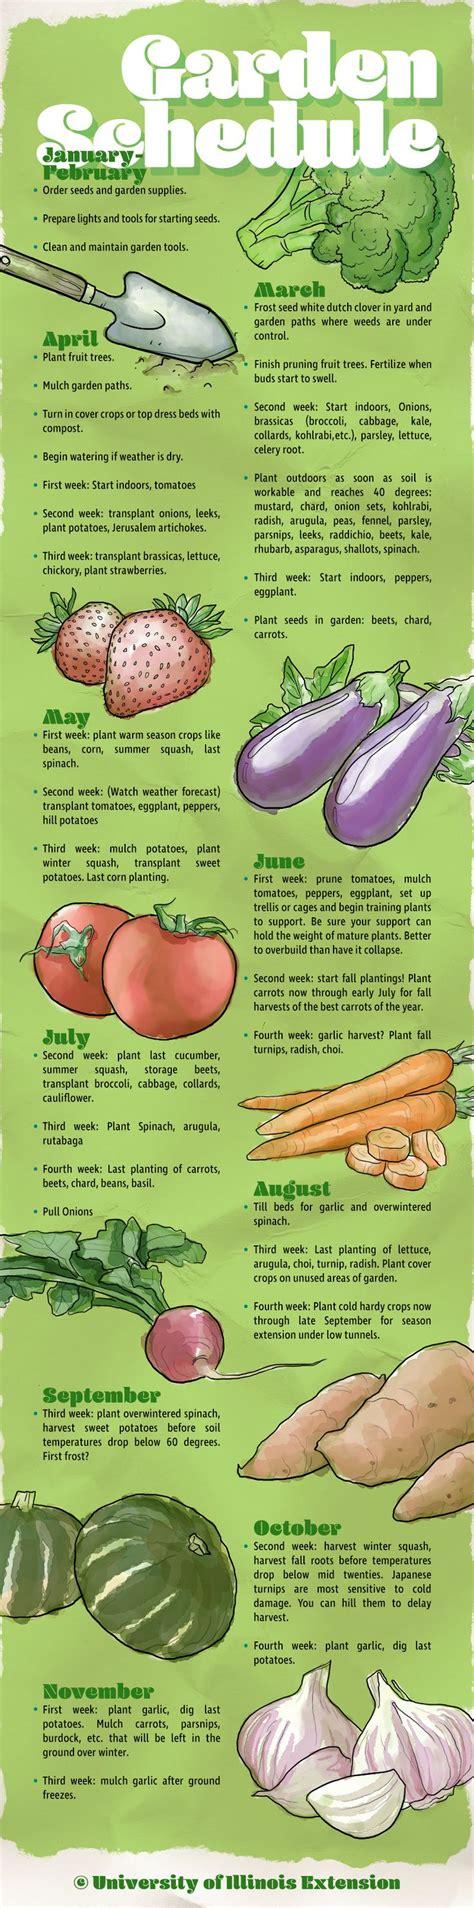 vegetable garden care 25 best ideas about vegetable gardening on